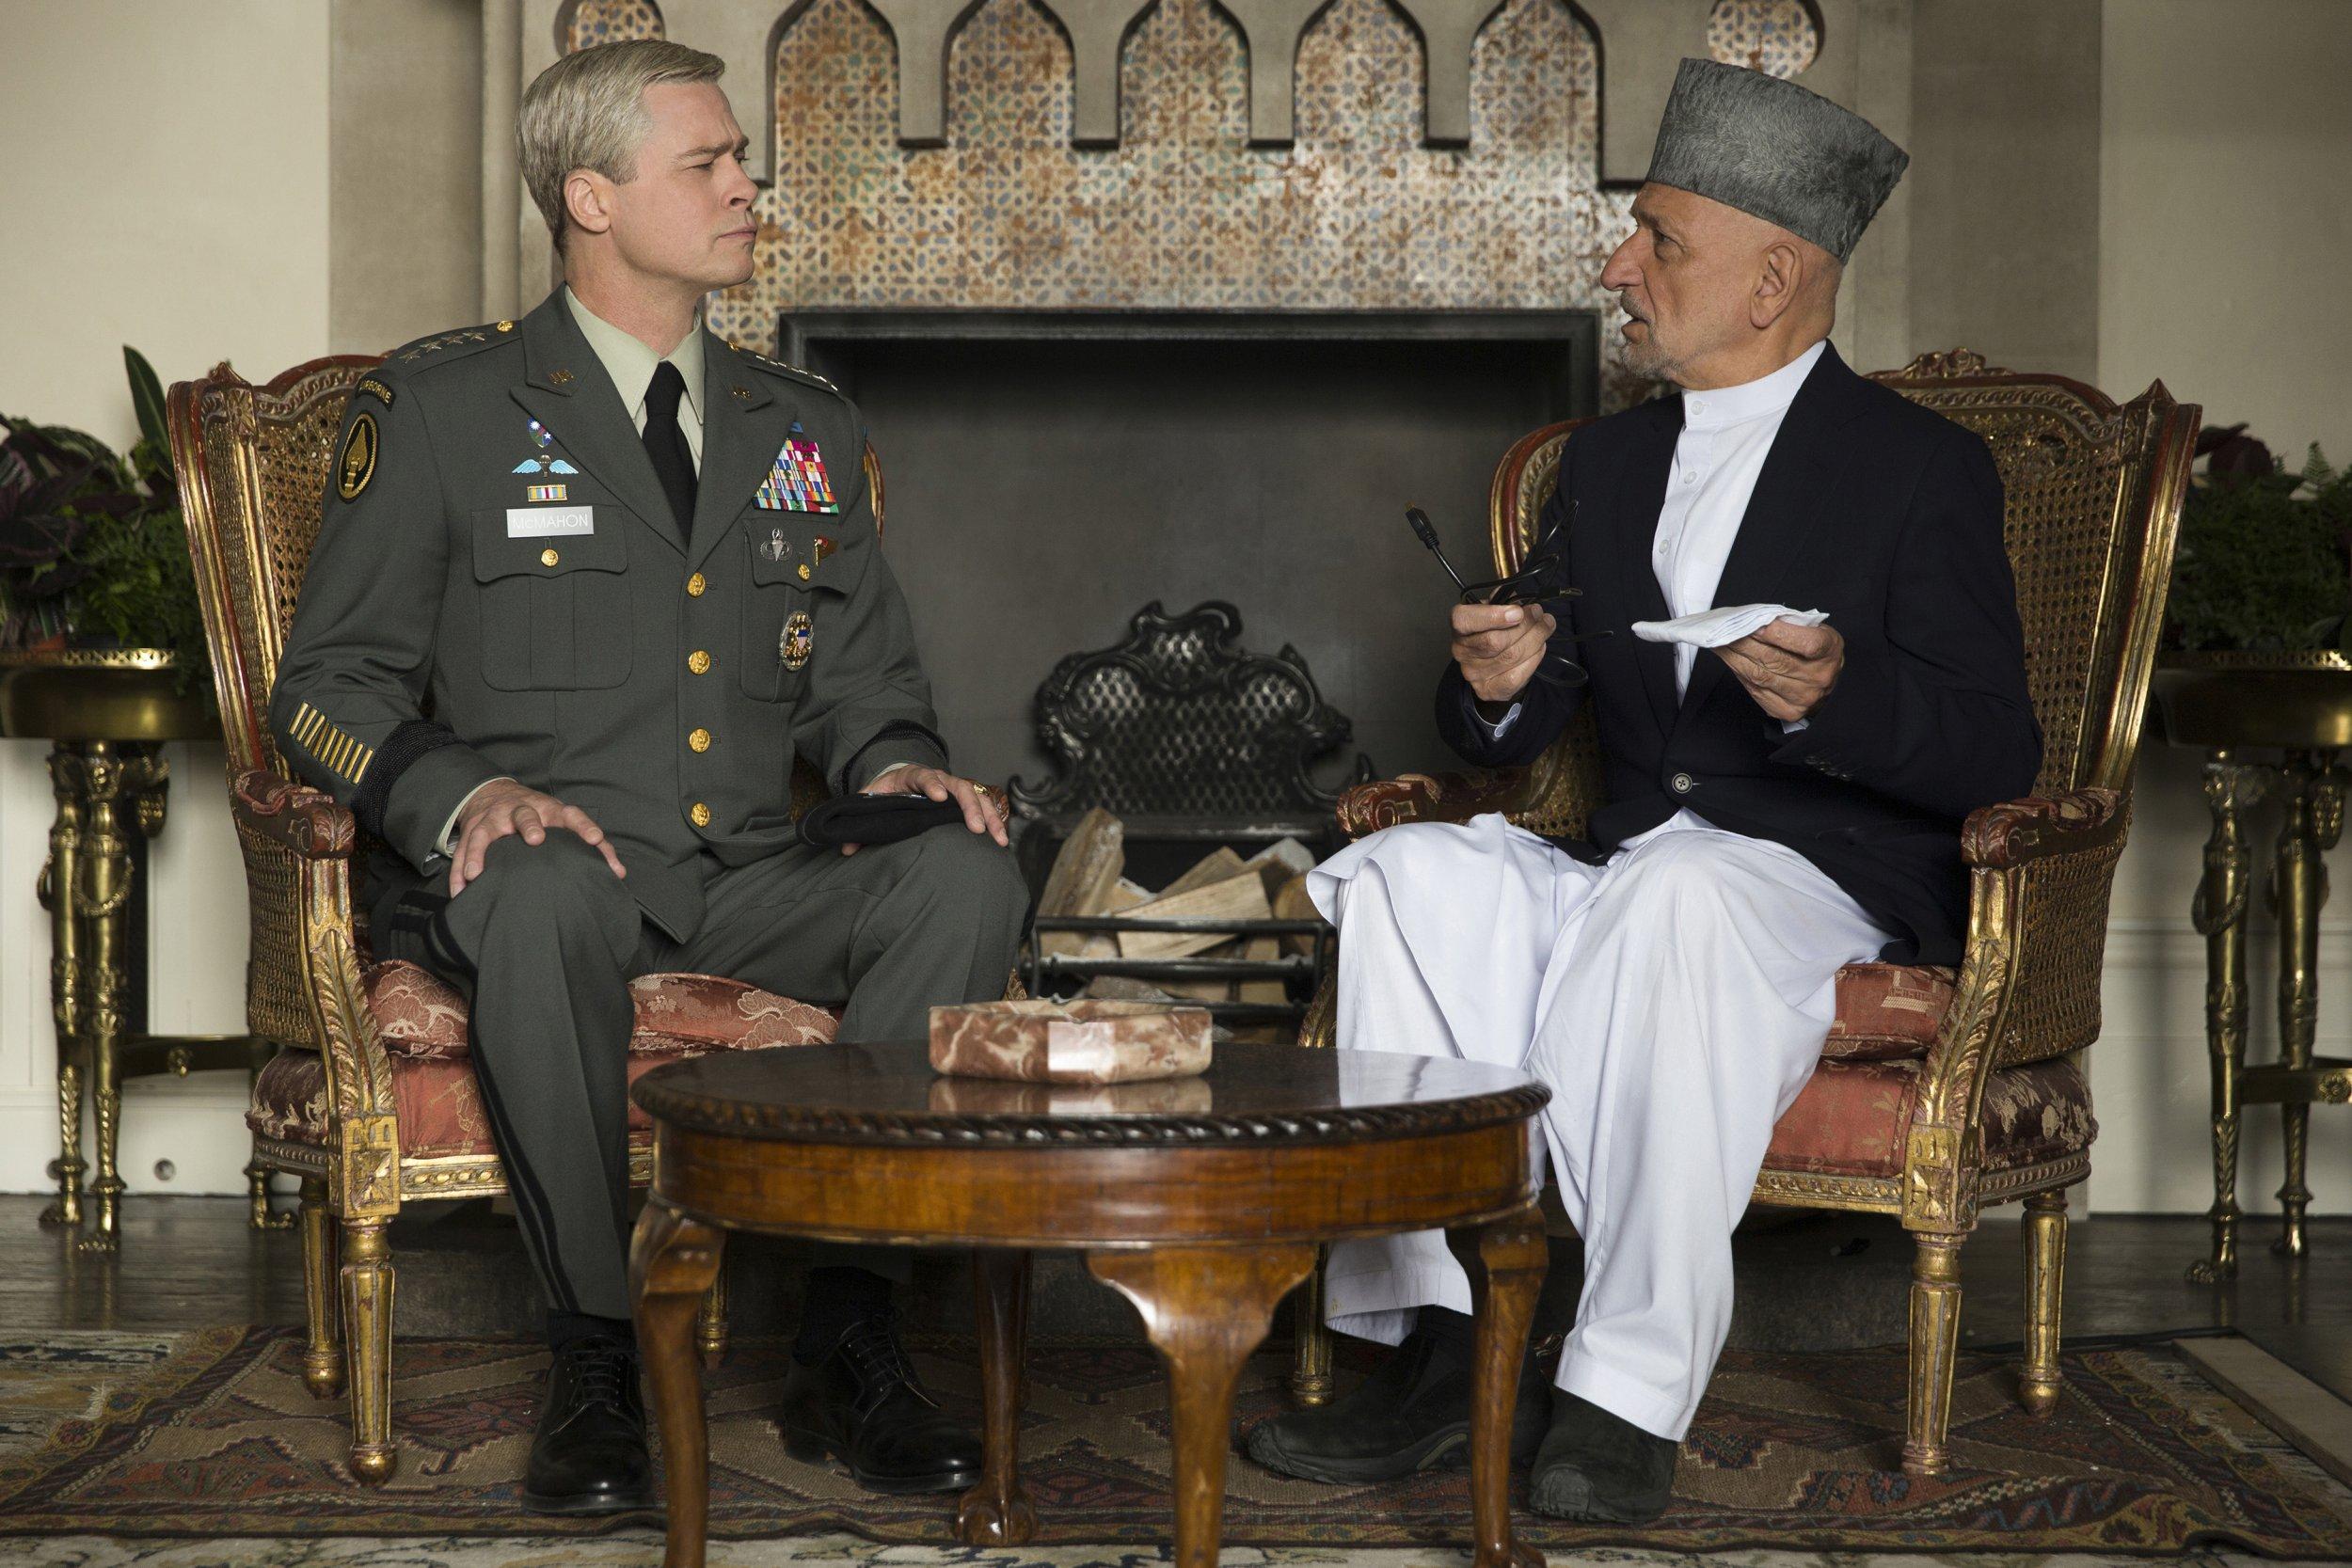 Ben Kingsley and Brad Pitt in War Machine